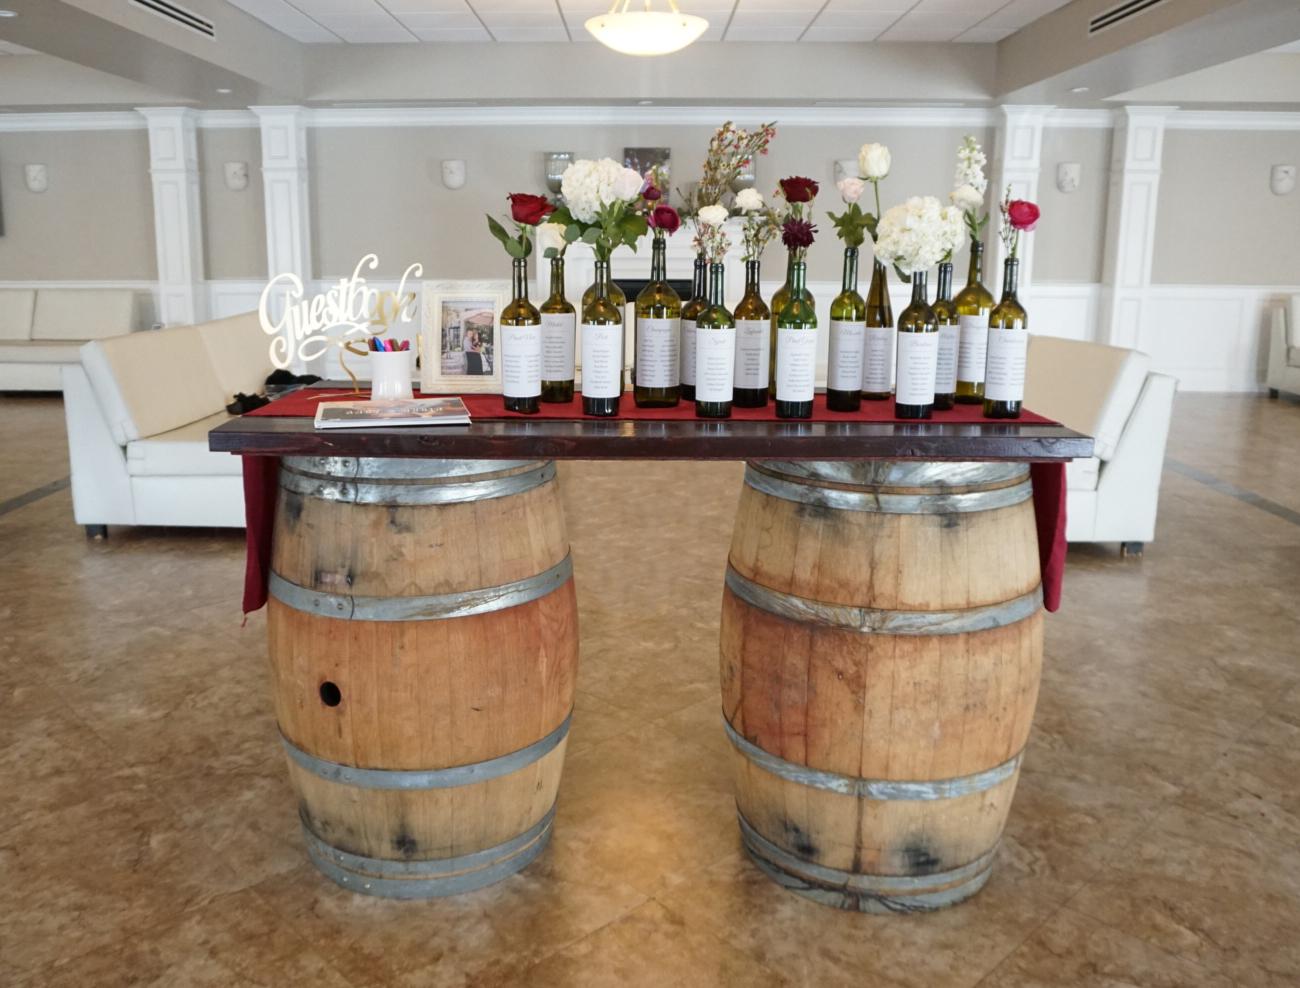 Wine Barrels - Pair of 3.5' oak wine barrels(Includes optional Wooden plank)$100